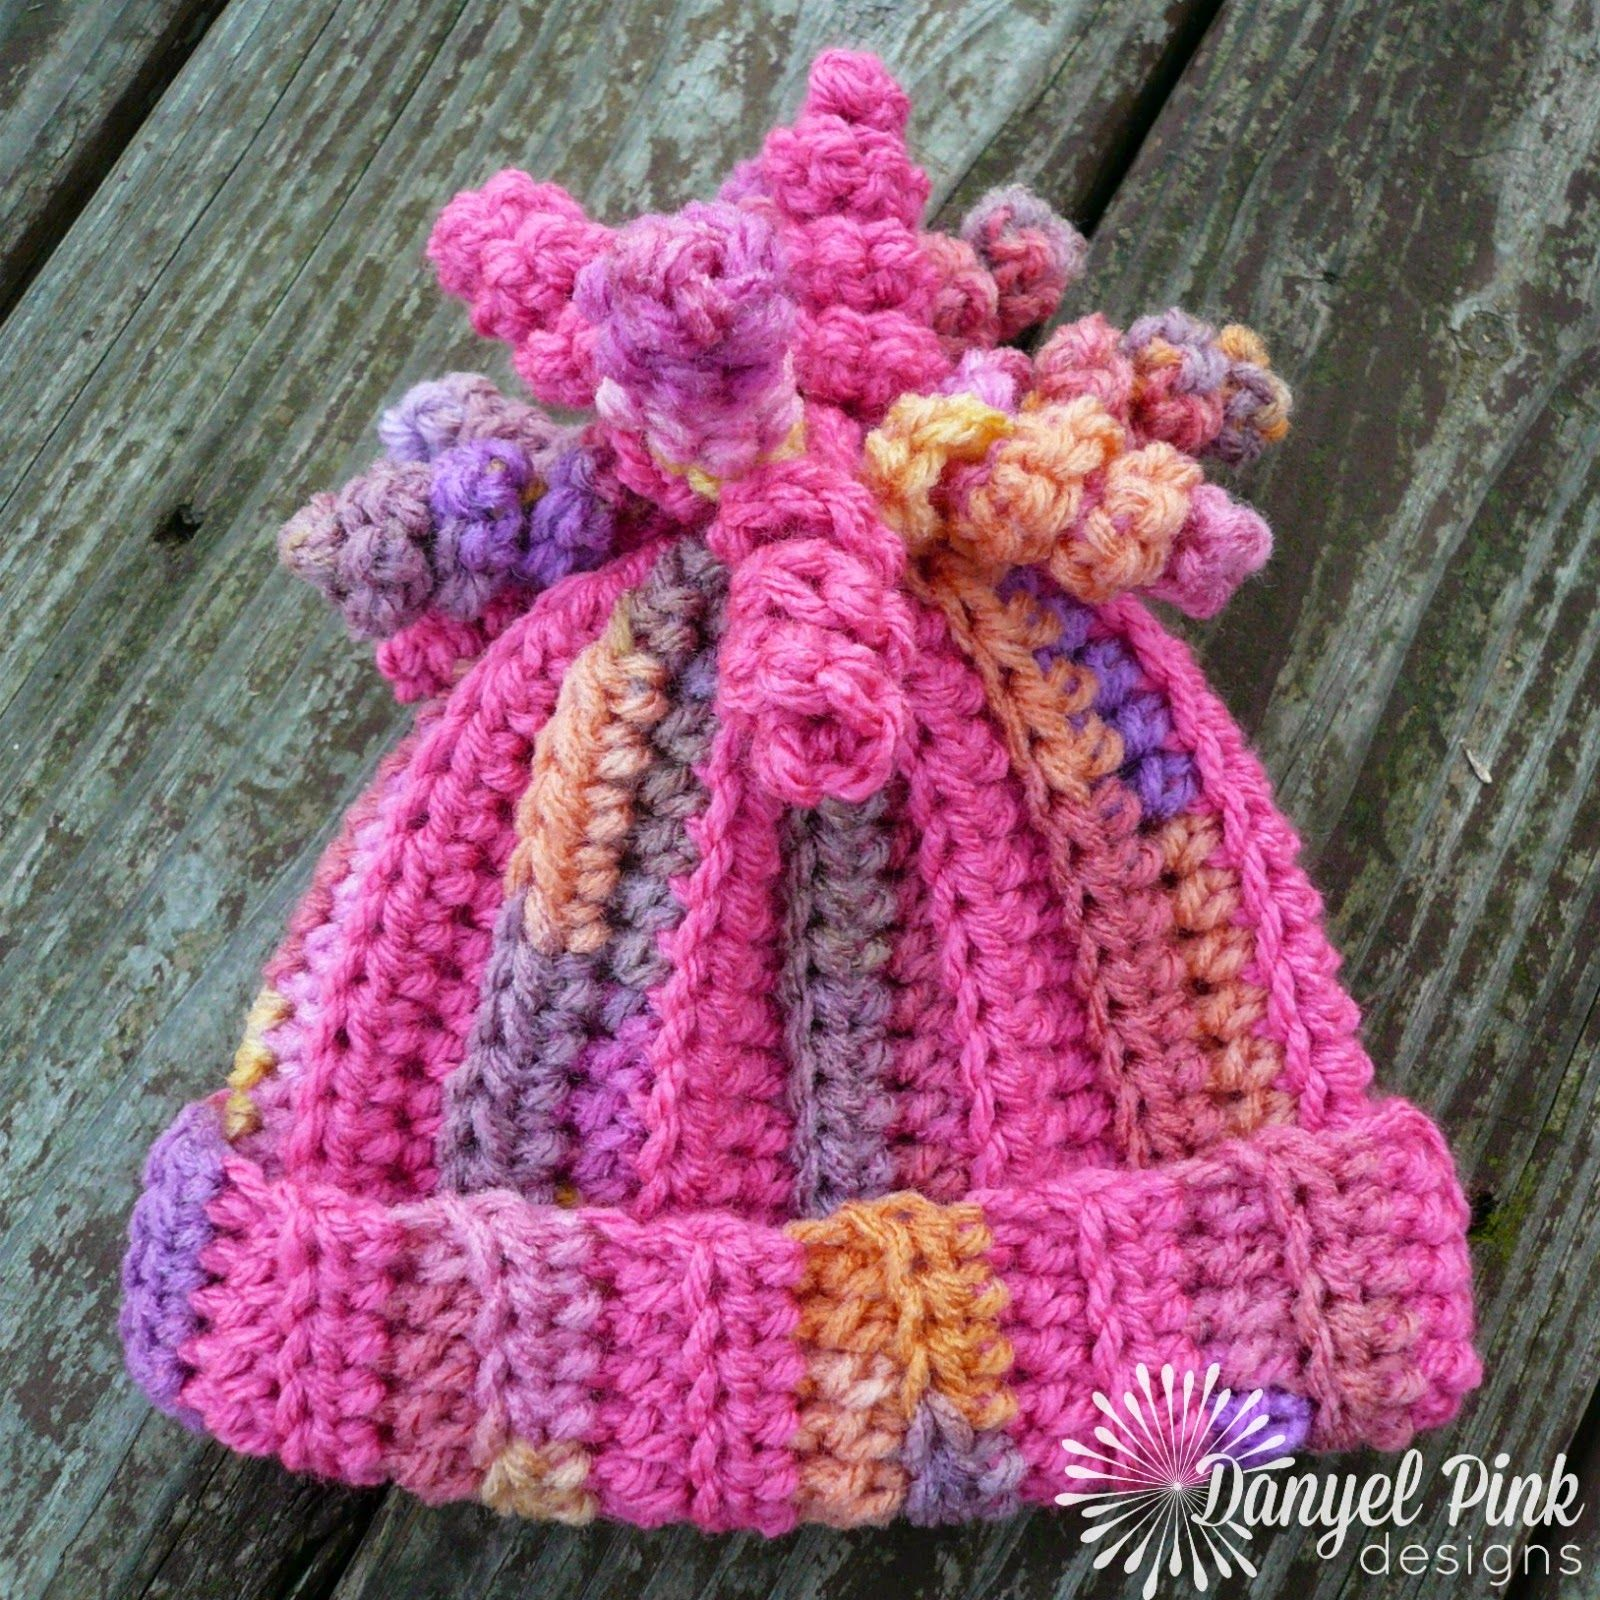 Danyel Pink Designs: FREE CROCHET PATTERN - Delaney Hat,#haken ...